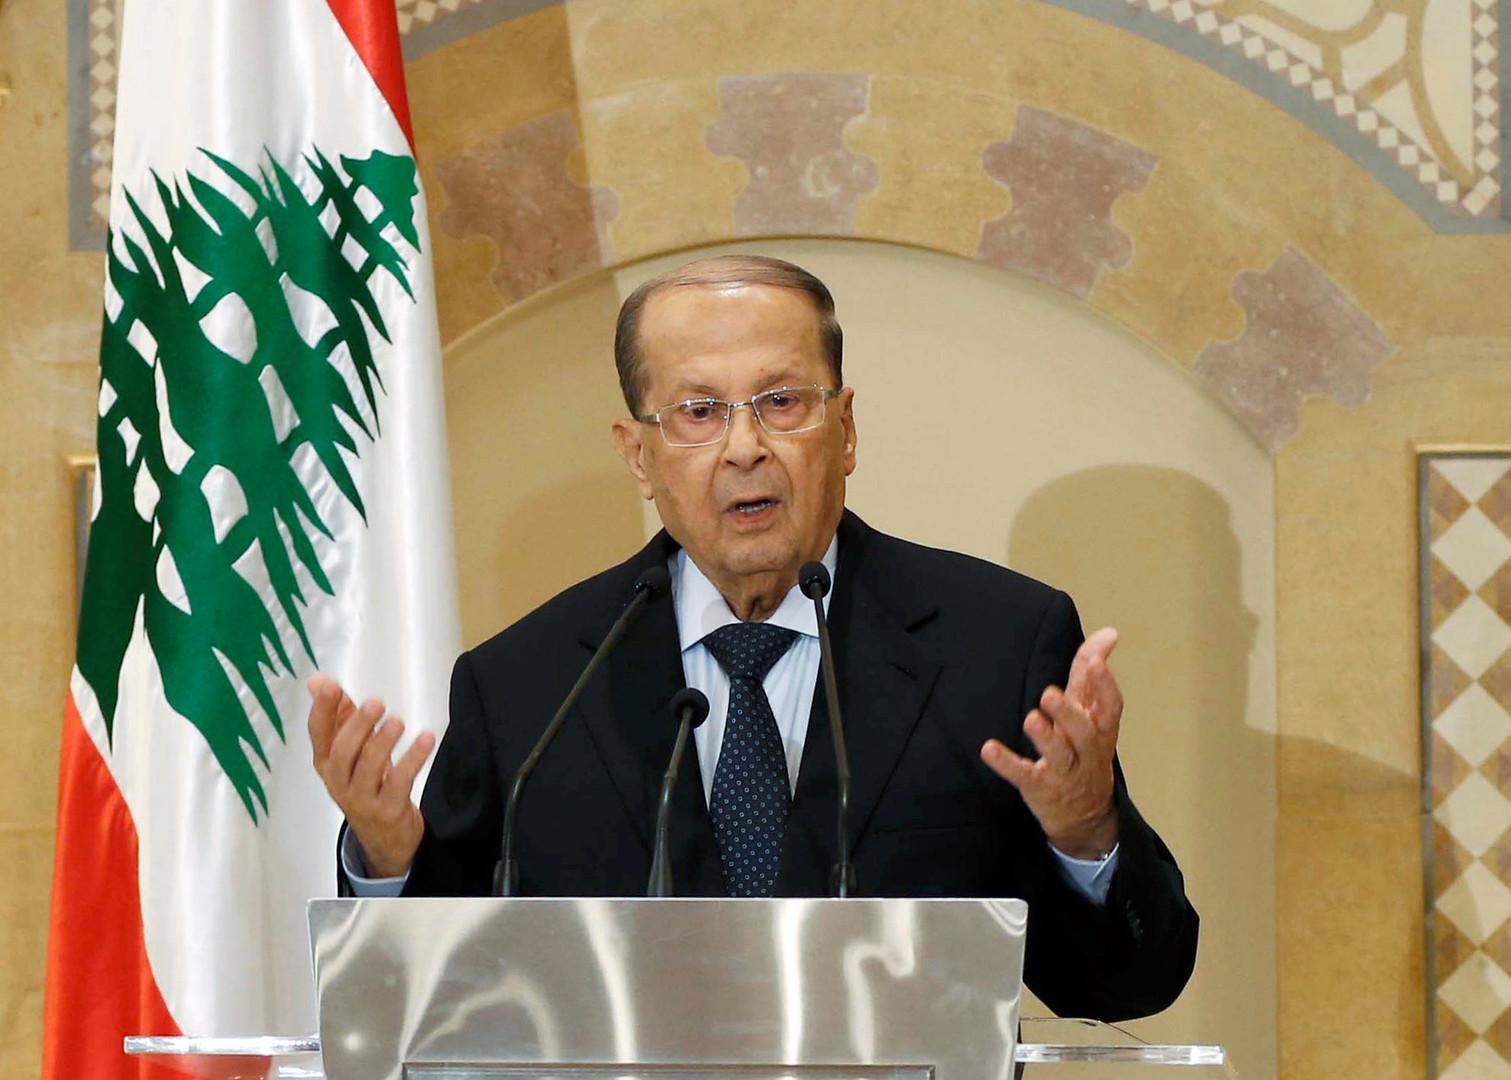 Photo of عون: أتعهد للبنانين بكشف حقيقة ما حصل بانفجار المرفأ وبدأت بالخطوة الأولى